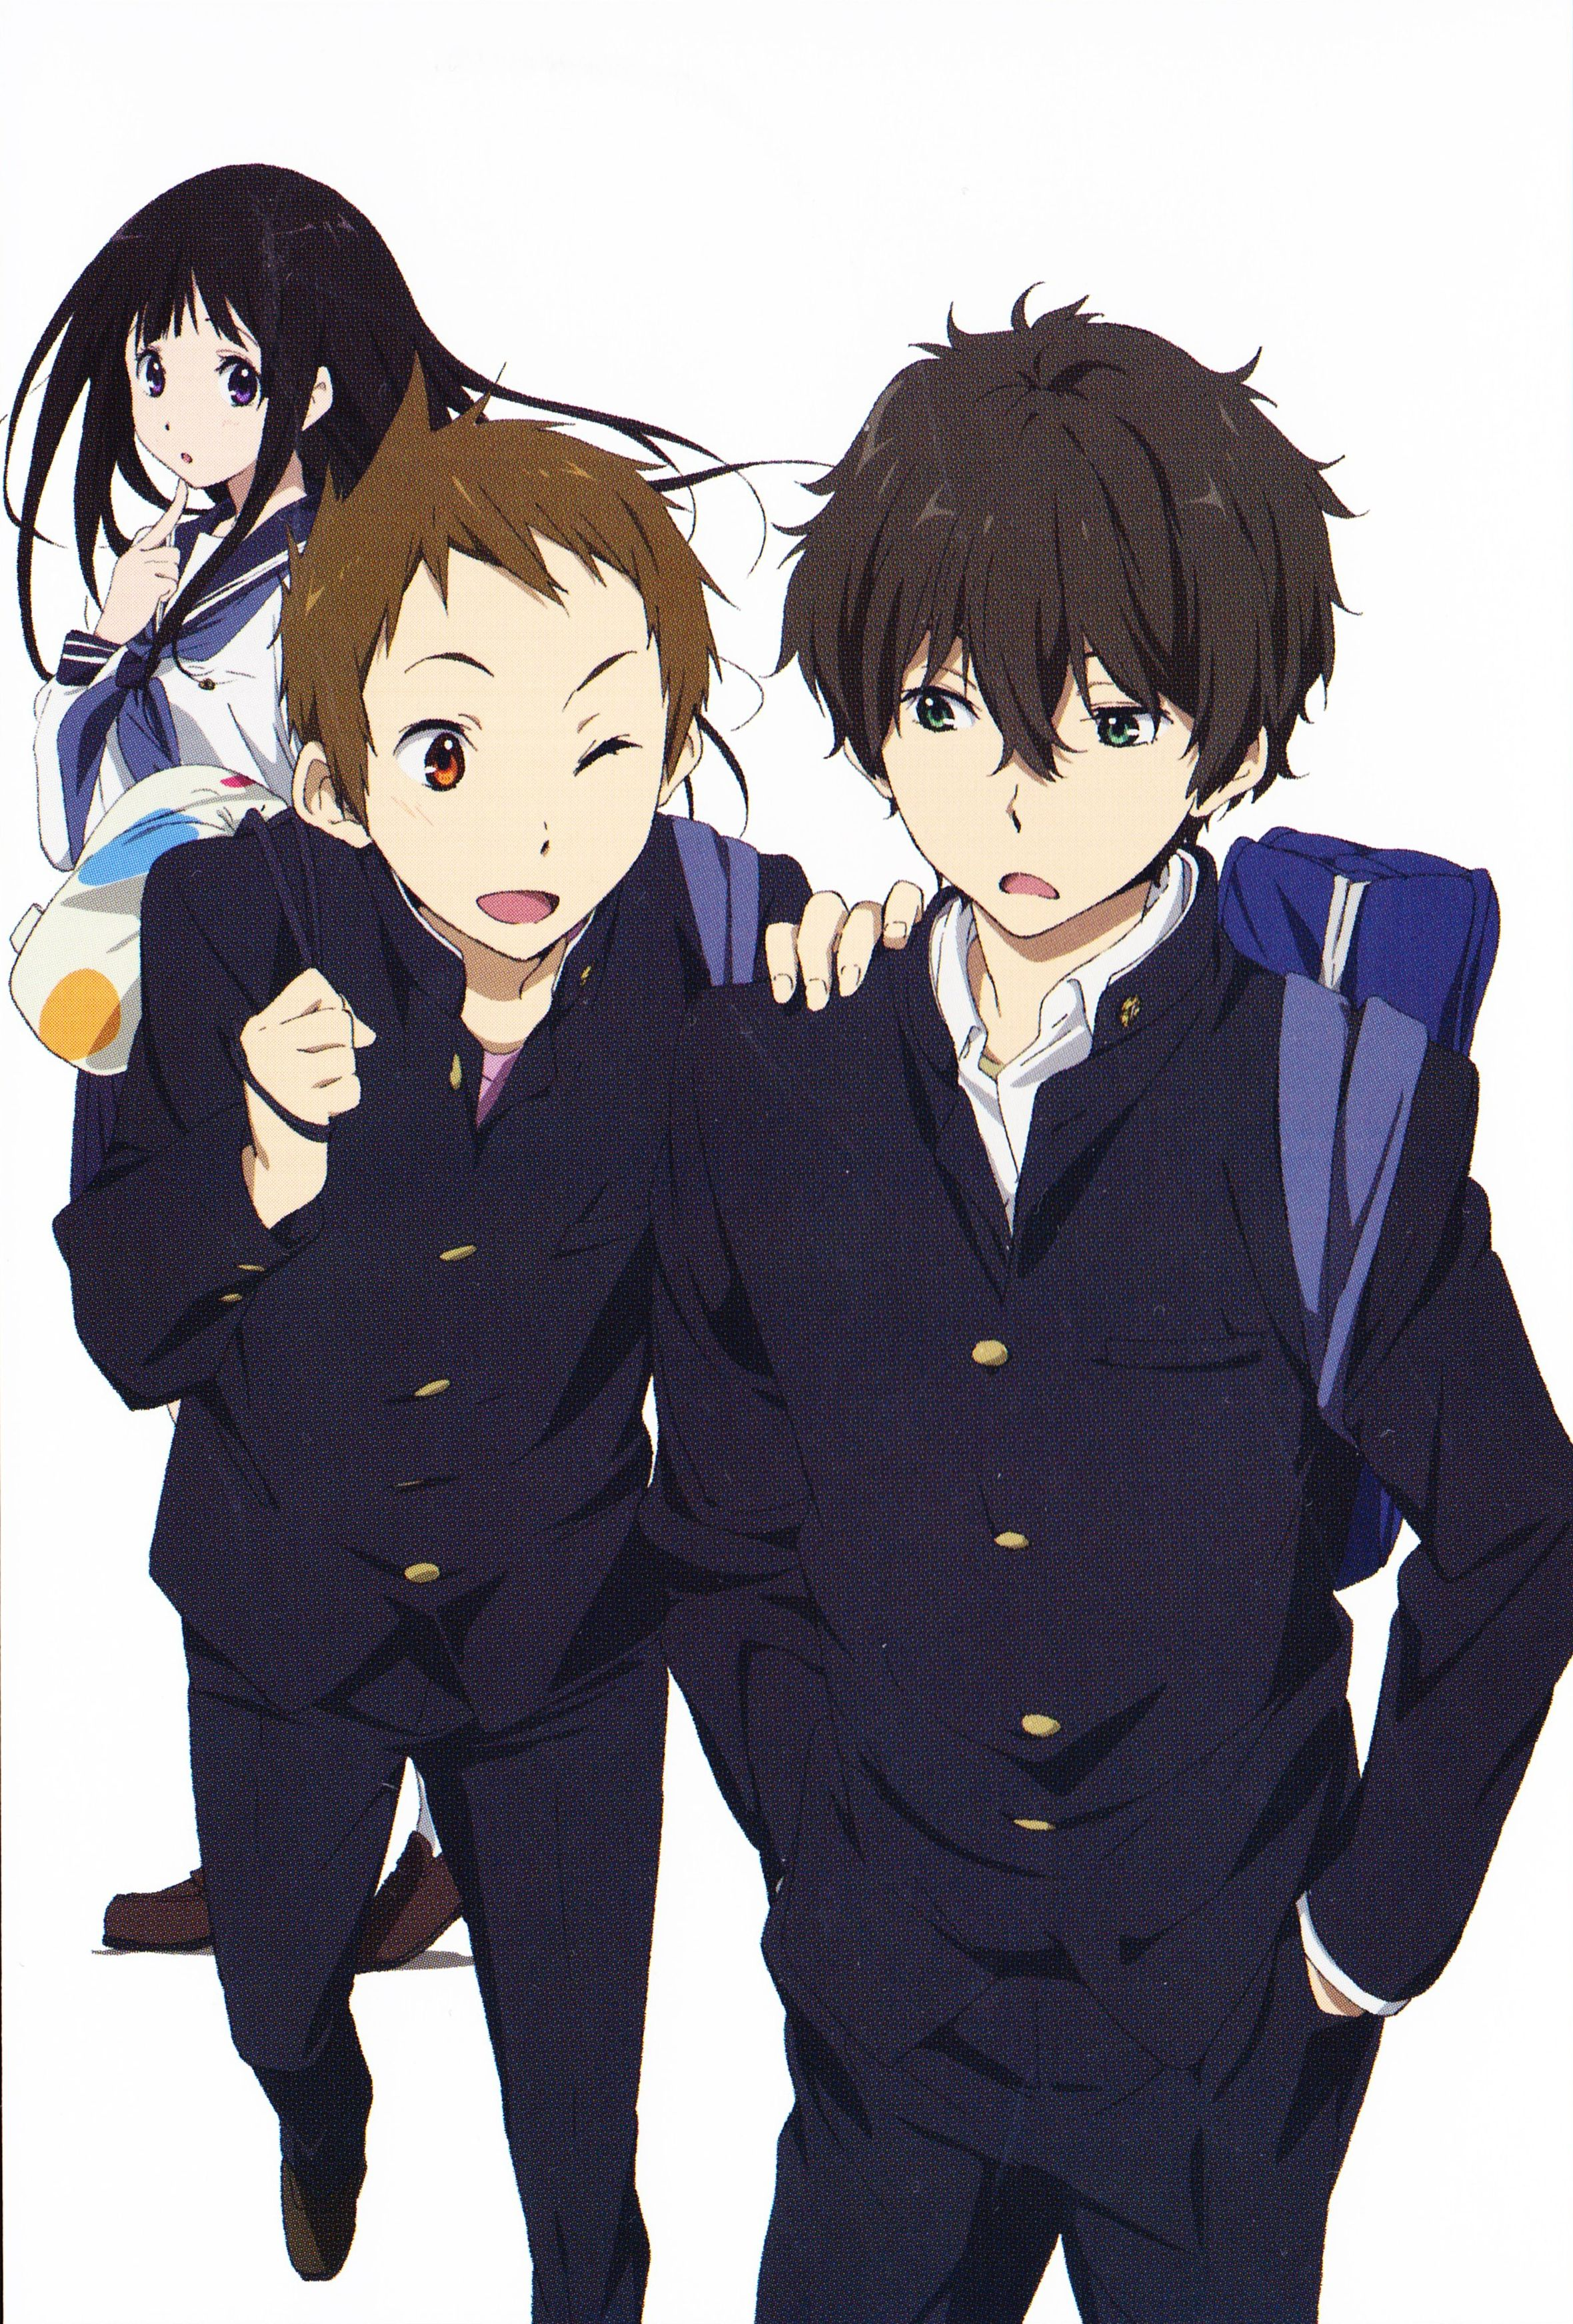 Hyouka Kyoto Animation Yonezawa Honobu Otaku anime